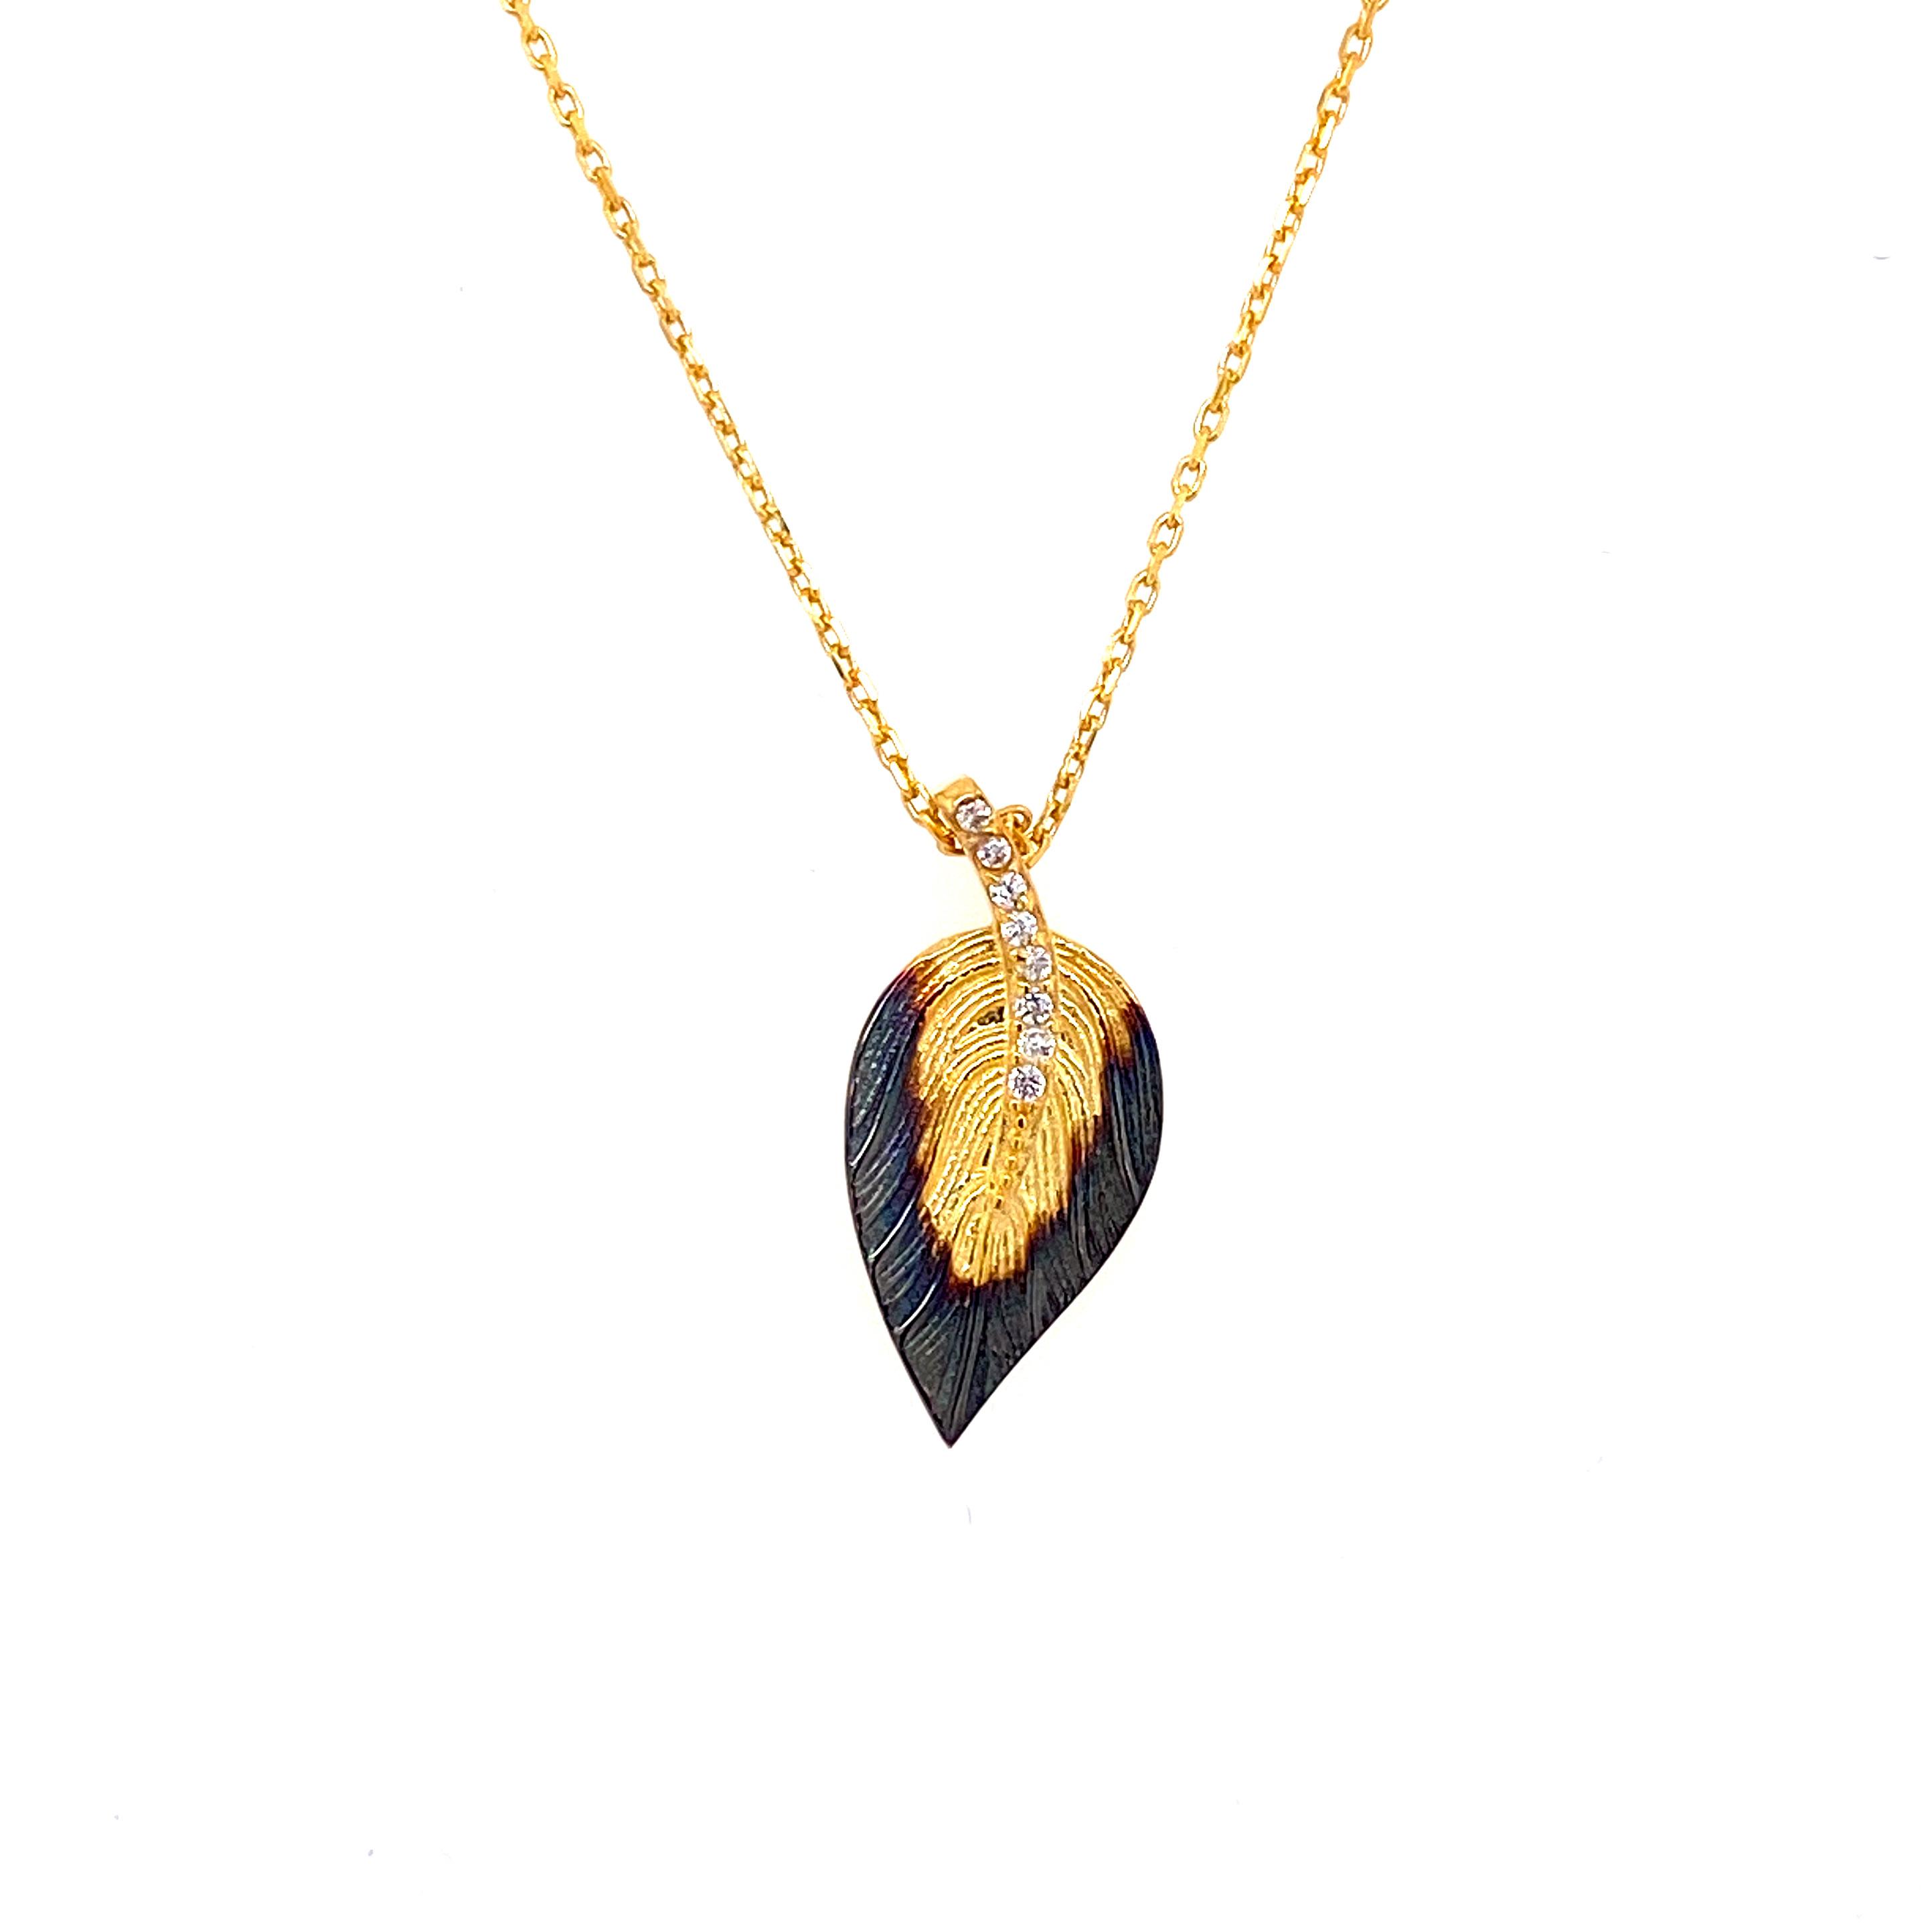 925 Silber Halskette | Blatt Zirkonia 2.1